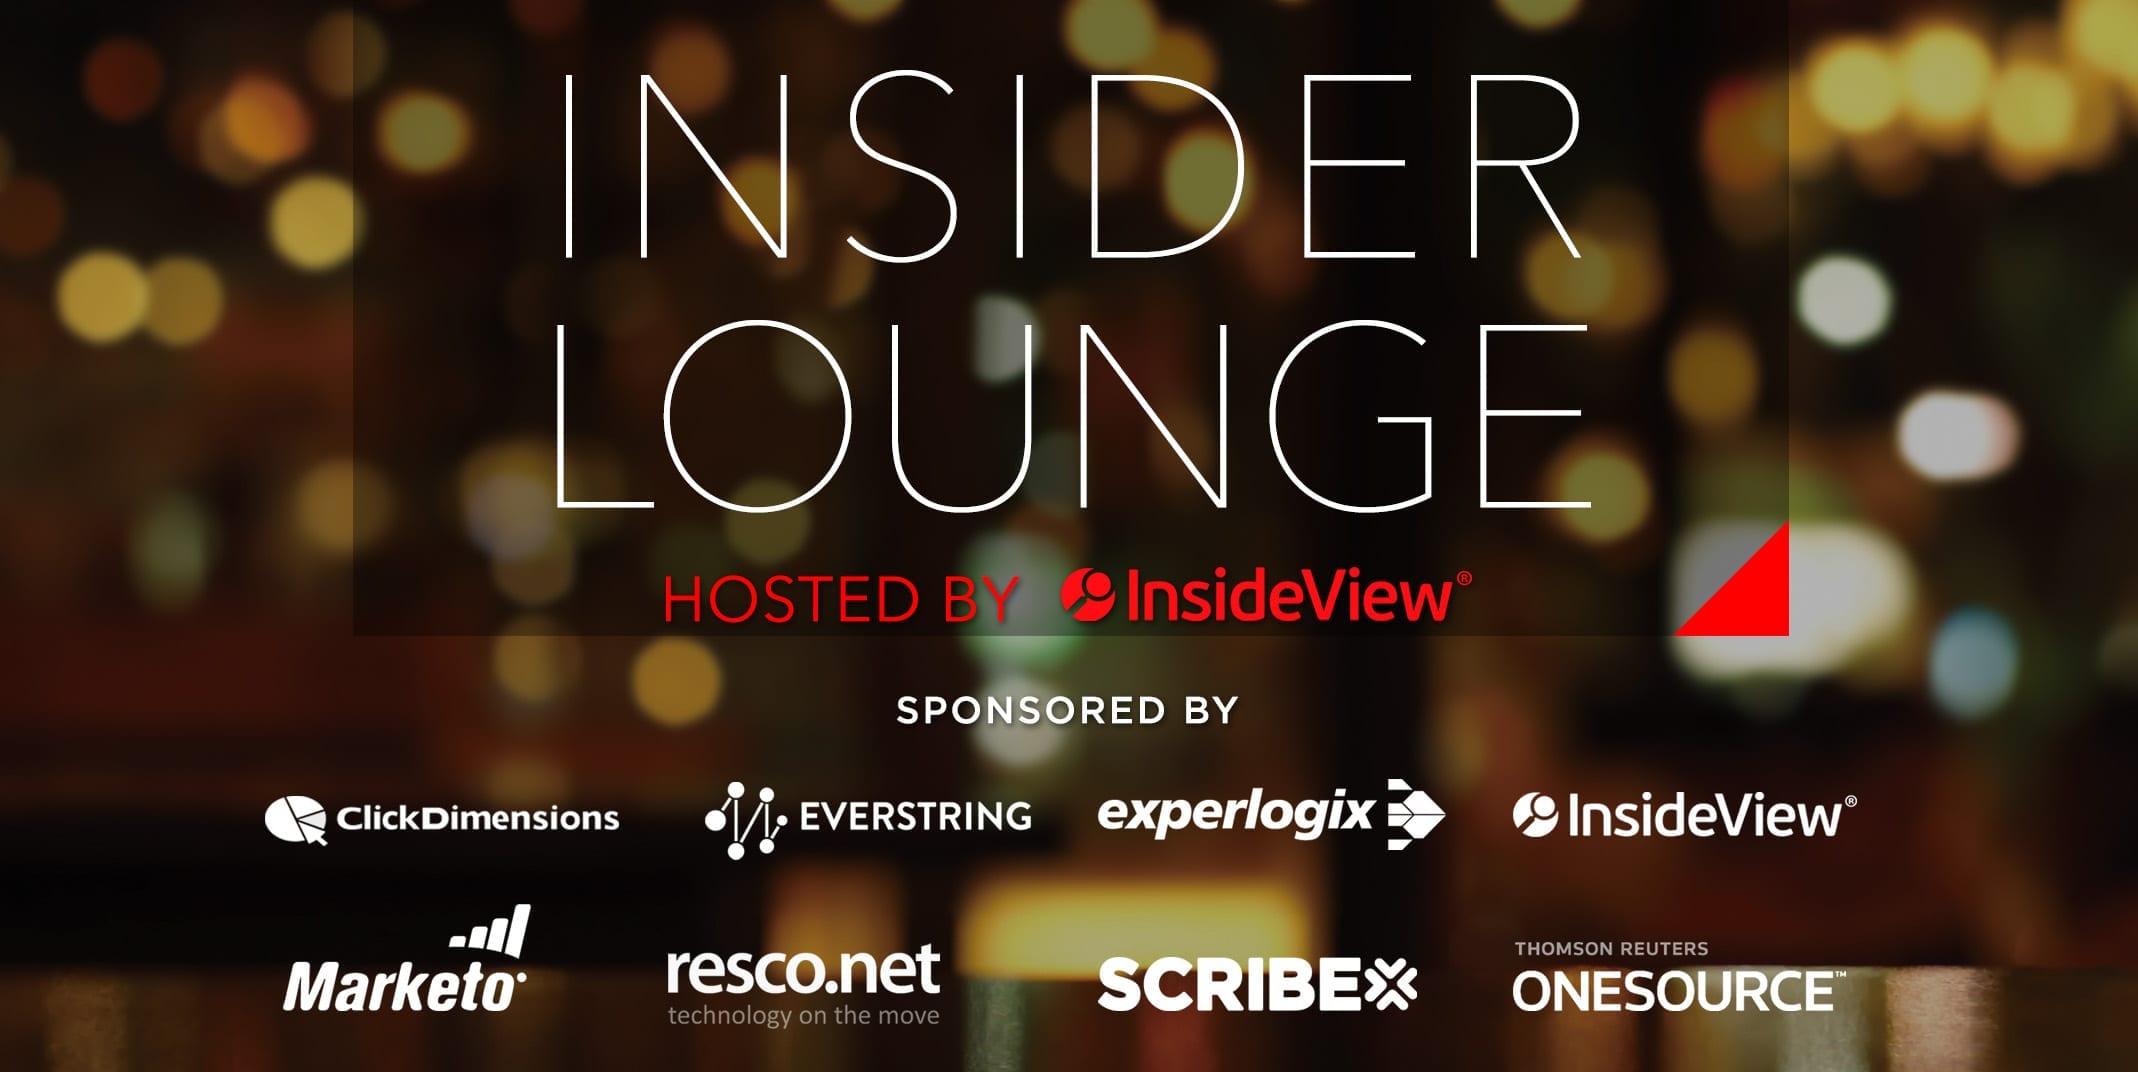 InsiderLoungeHeader+Sponsors